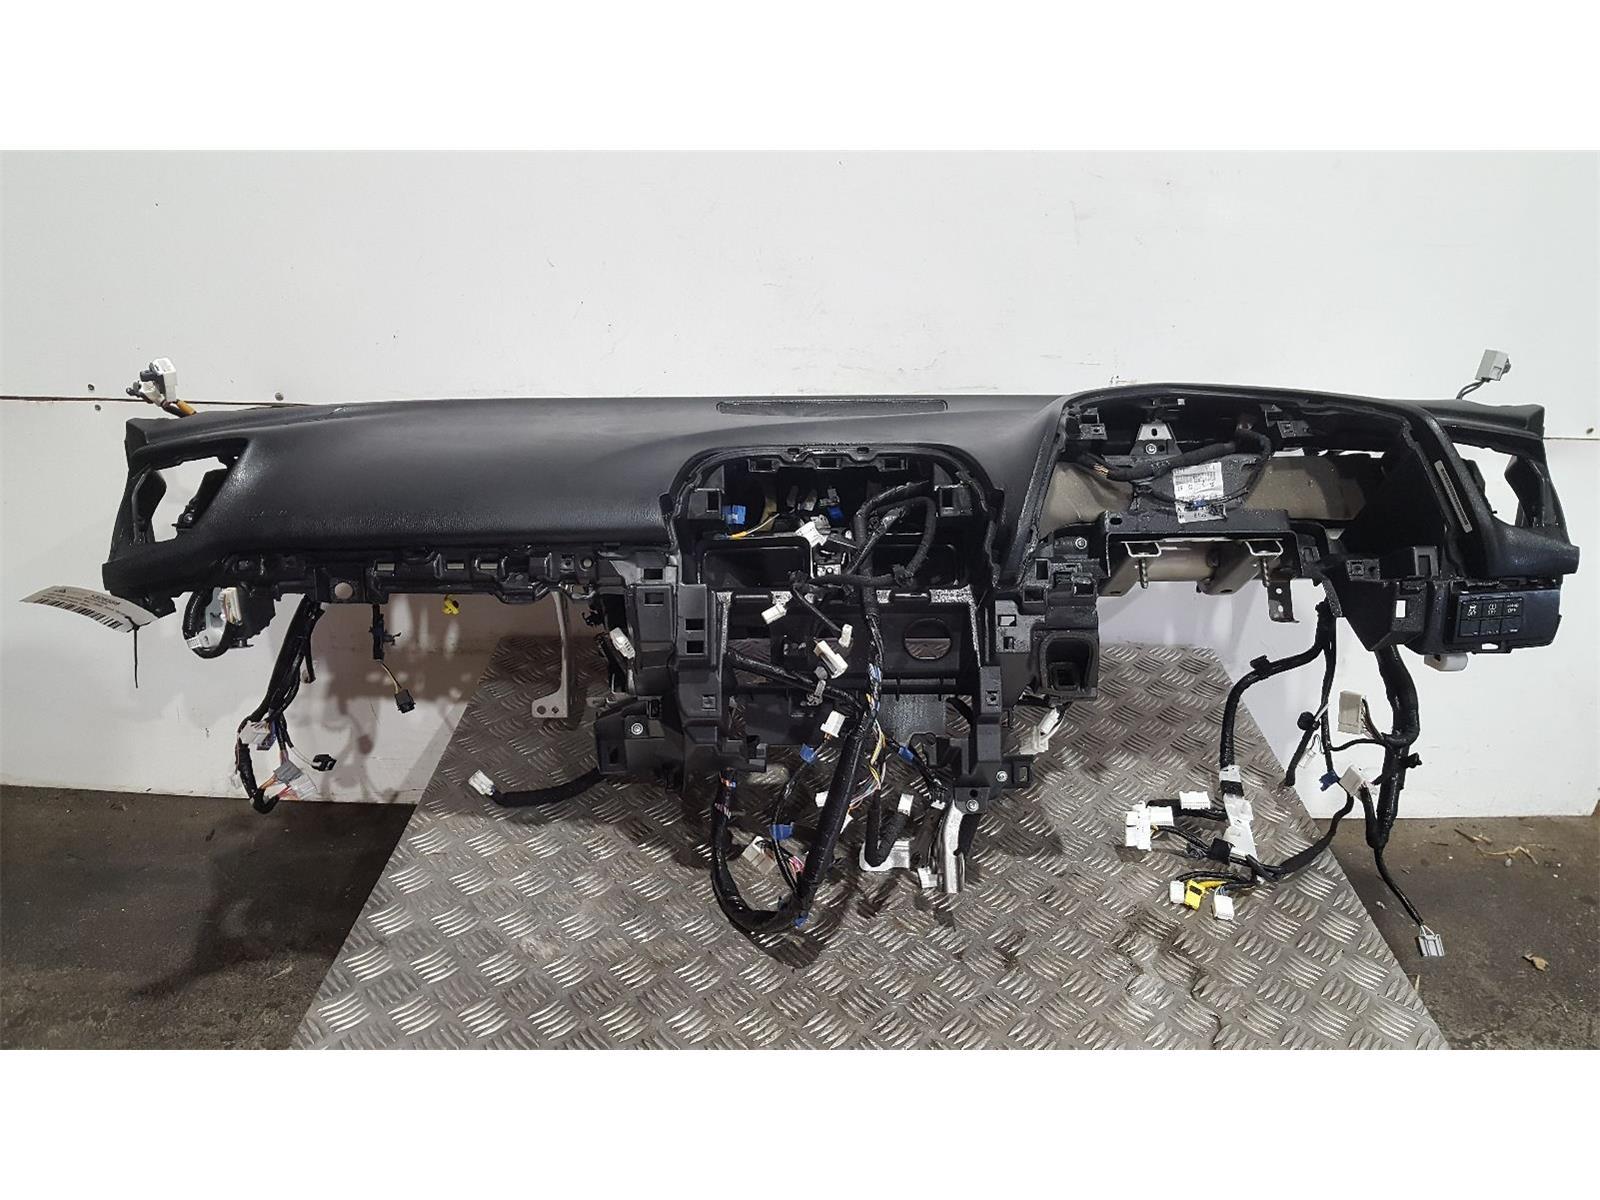 MAZDA 3 - MK3 (BM) 2013 TO 2019 Dashboard & Passenger Airbag